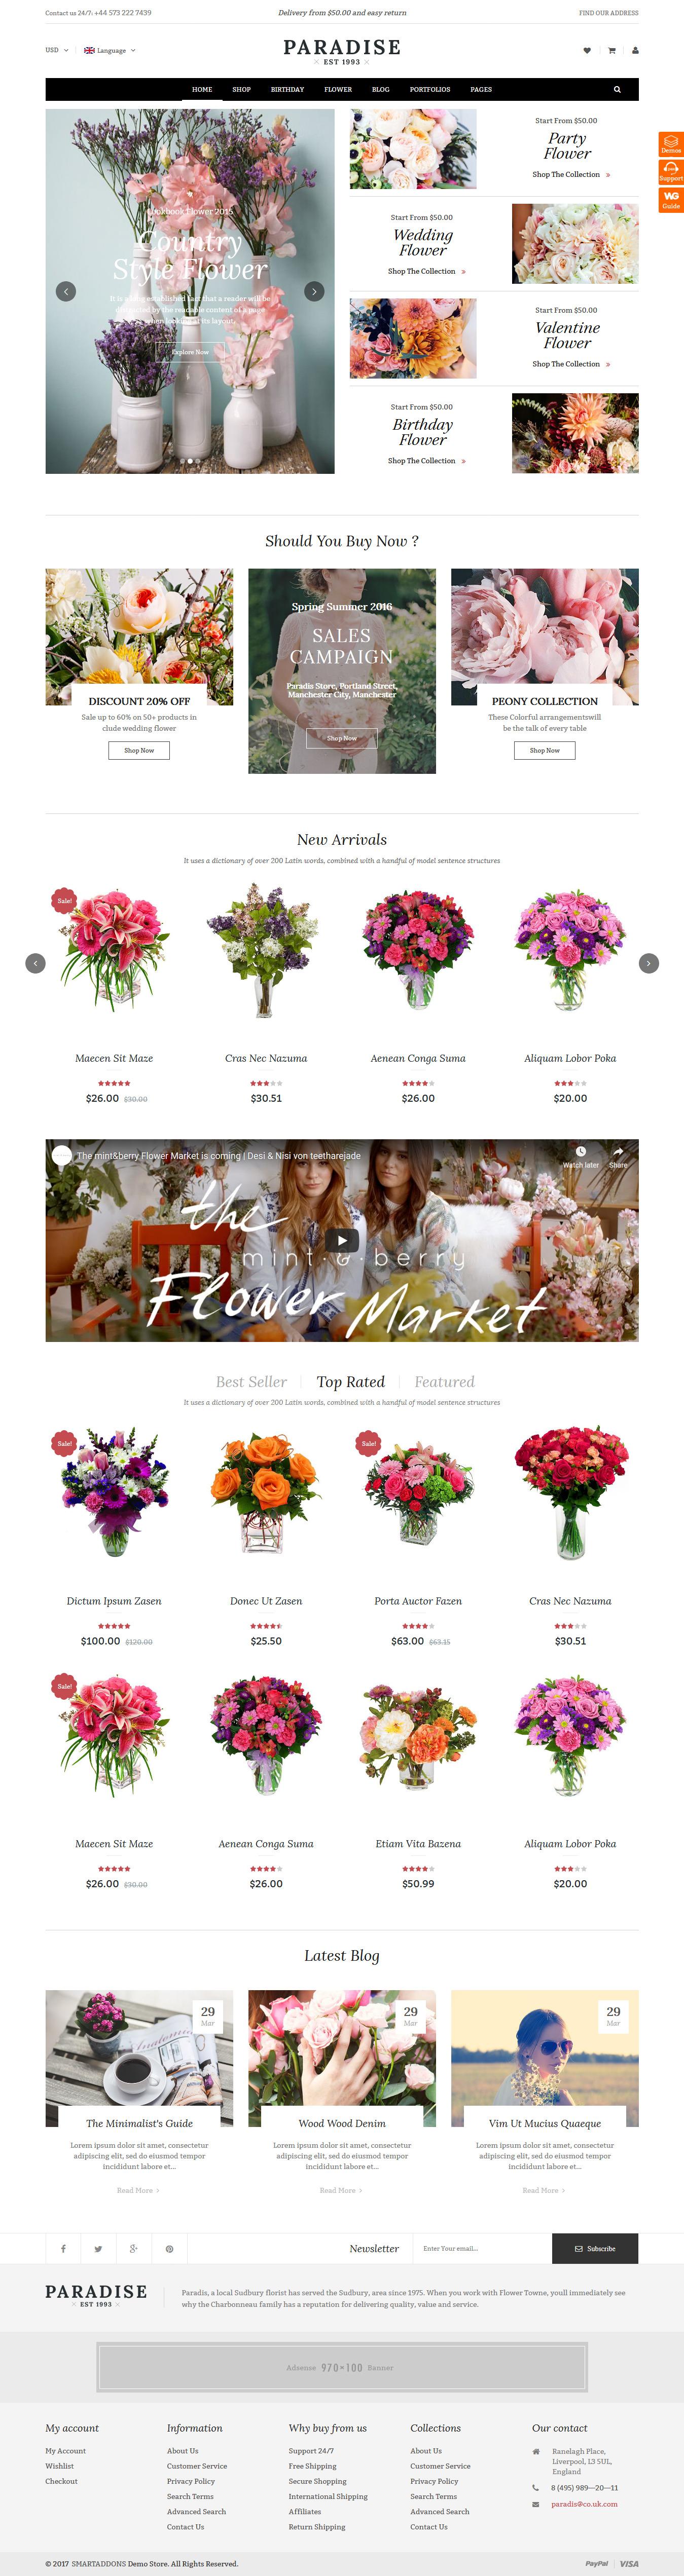 paradise best premium florist floriculture wordpress theme - 10+ Best Premium Florist and Floriculture WordPress Themes